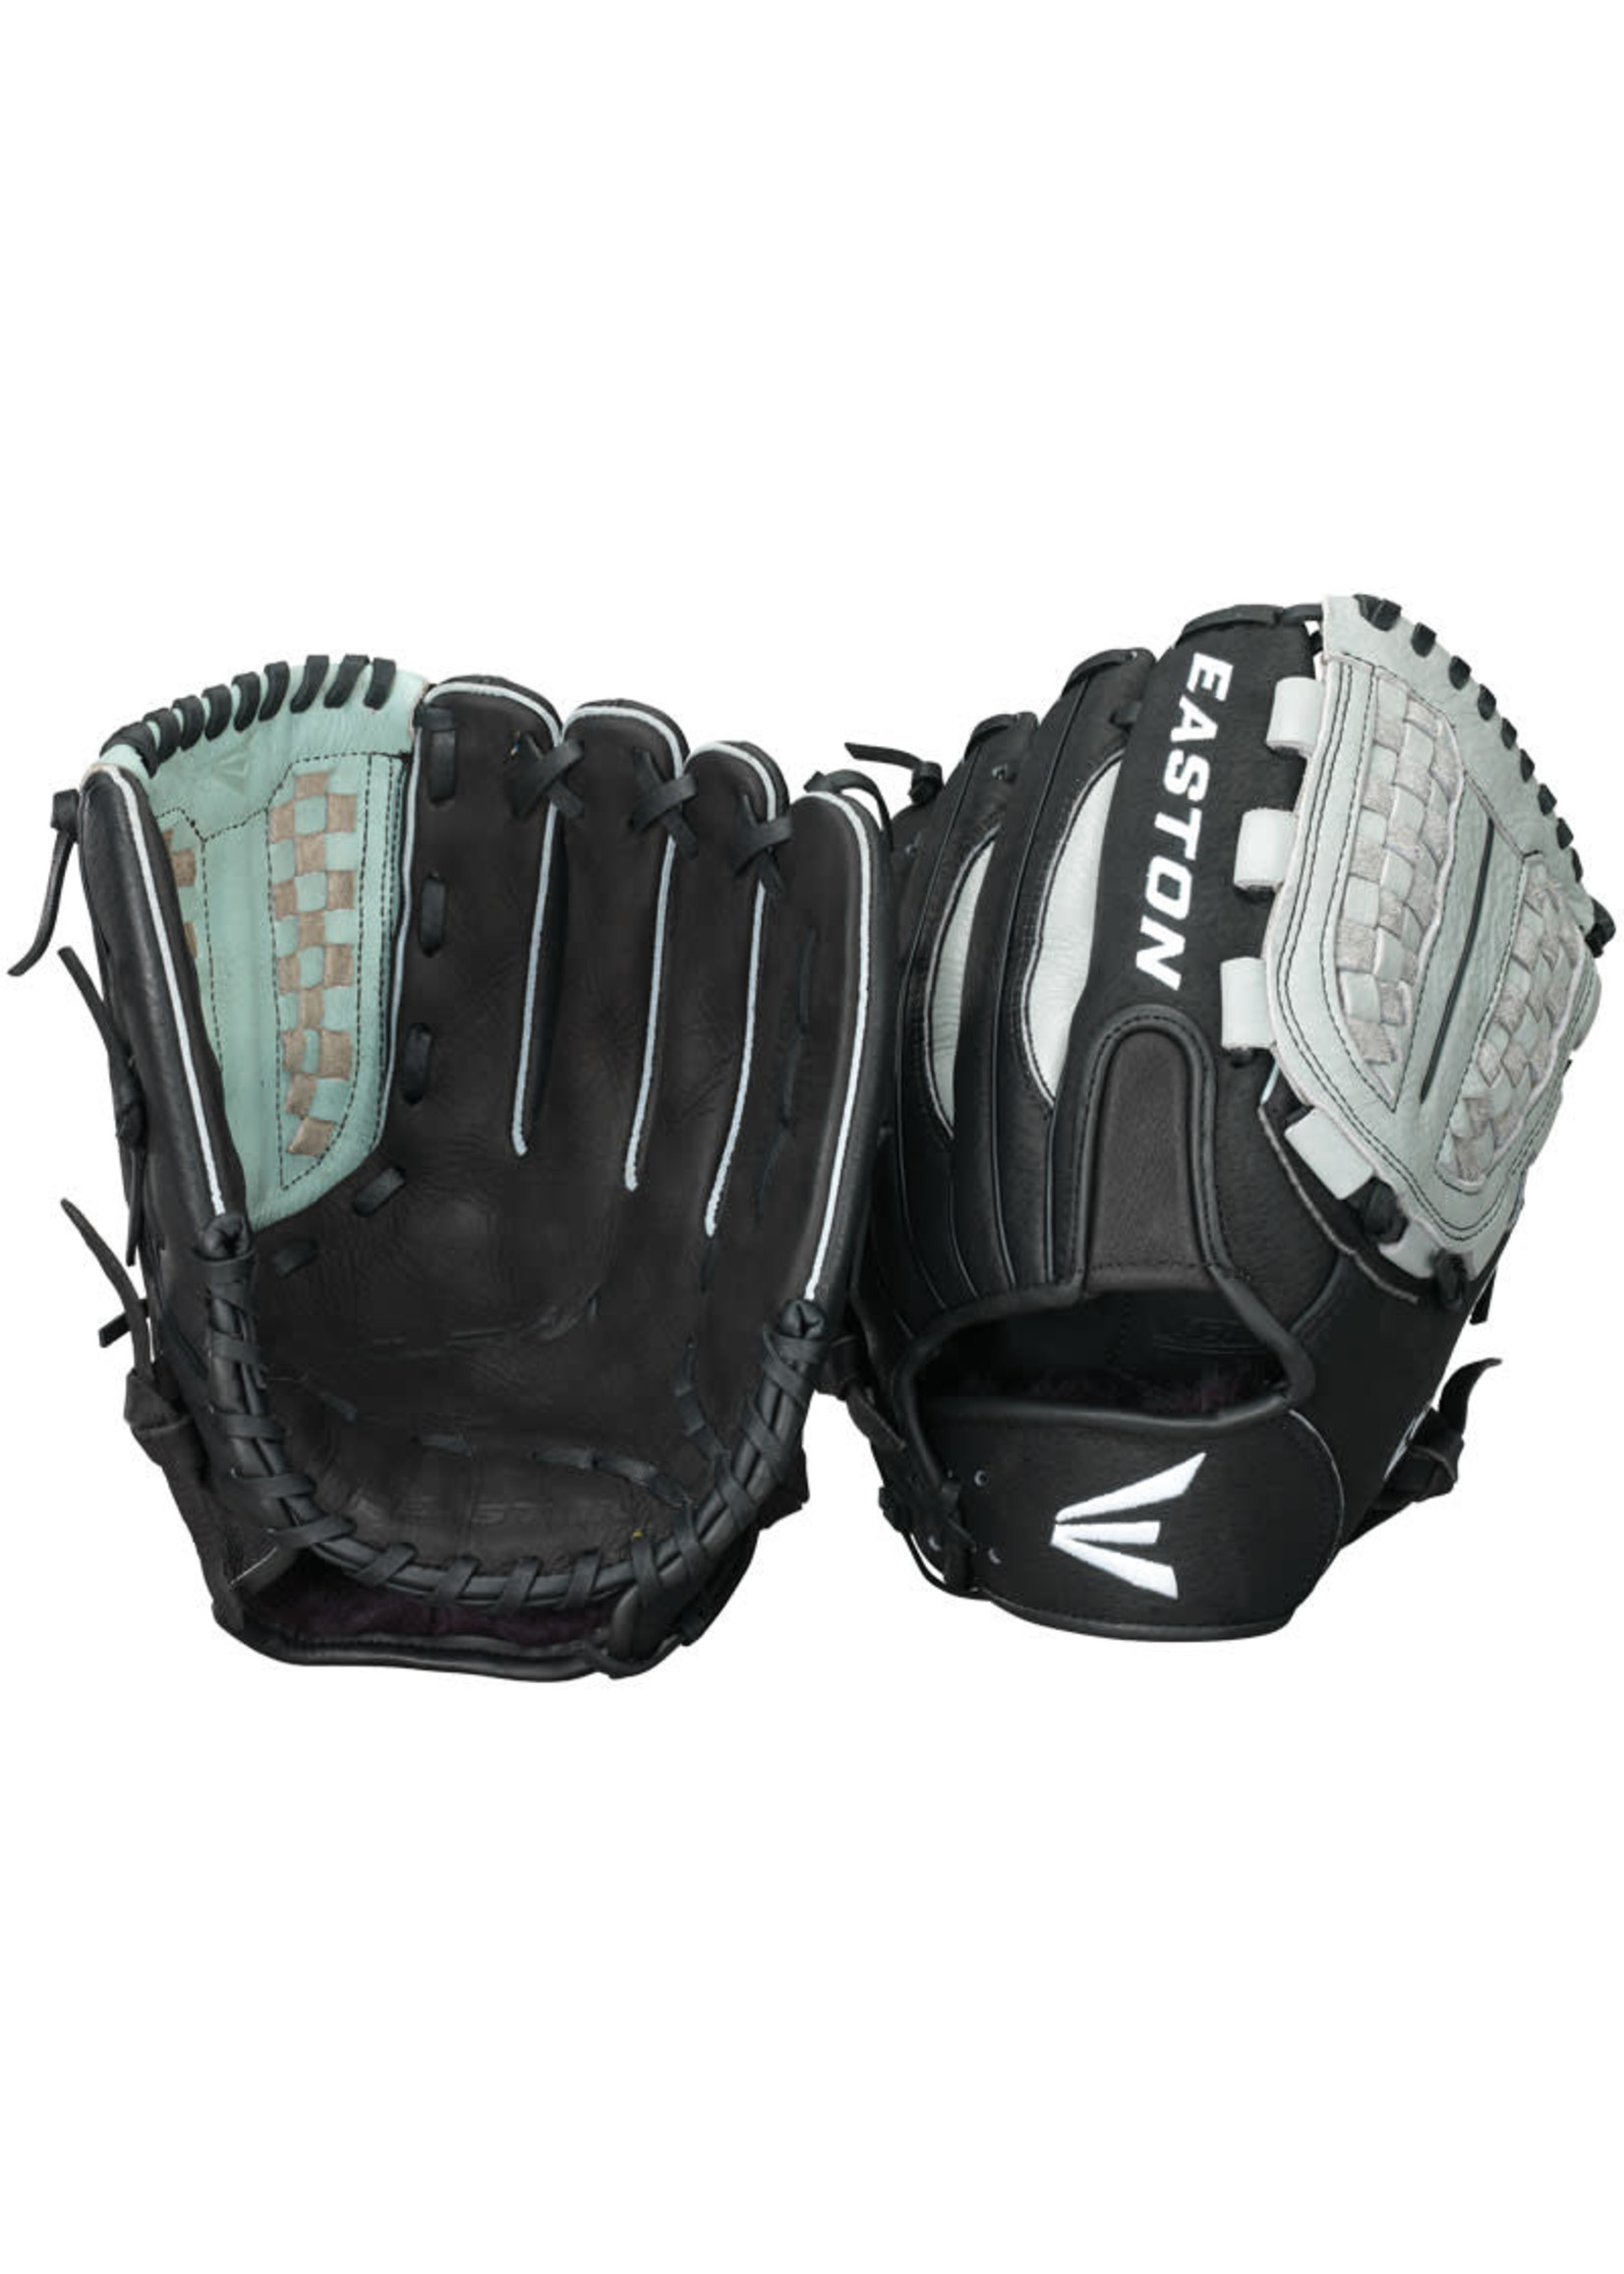 Easton Baseball (Canada) EASTON  ALPHA APB1200 BKGY 12 IN LHT